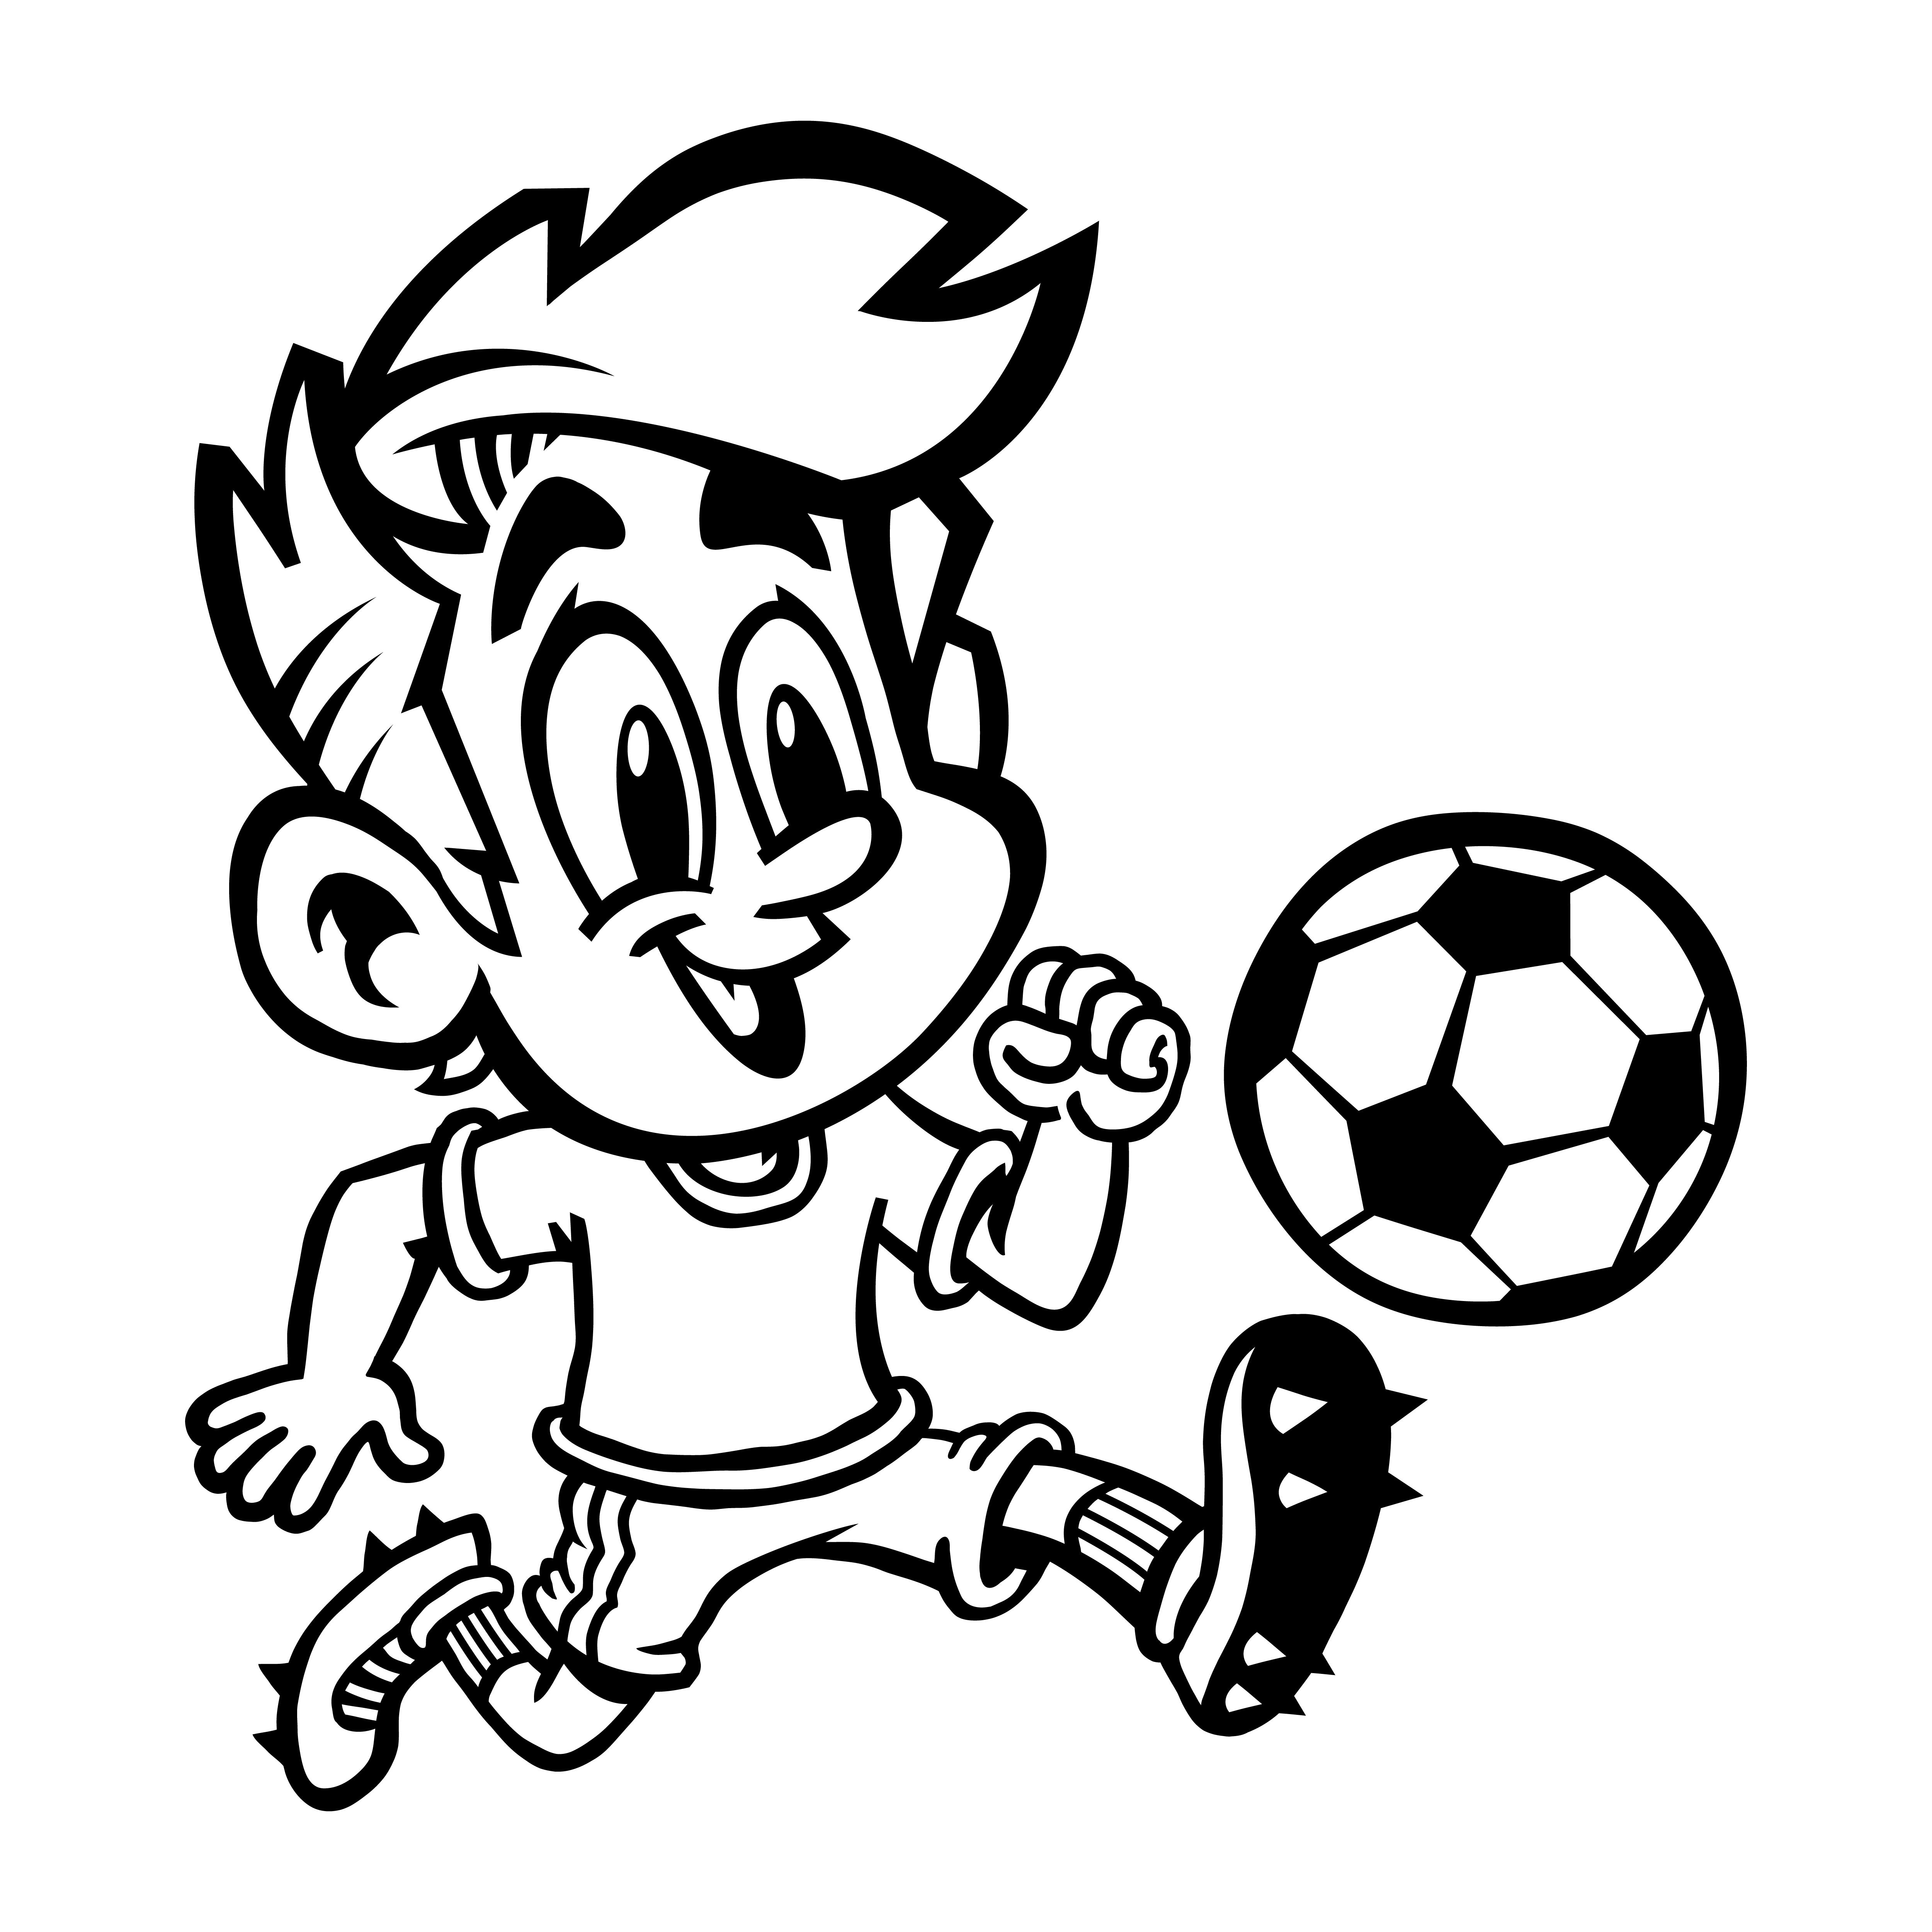 Cartoon Boy Kid Playing Football Or Soccer In A Green T